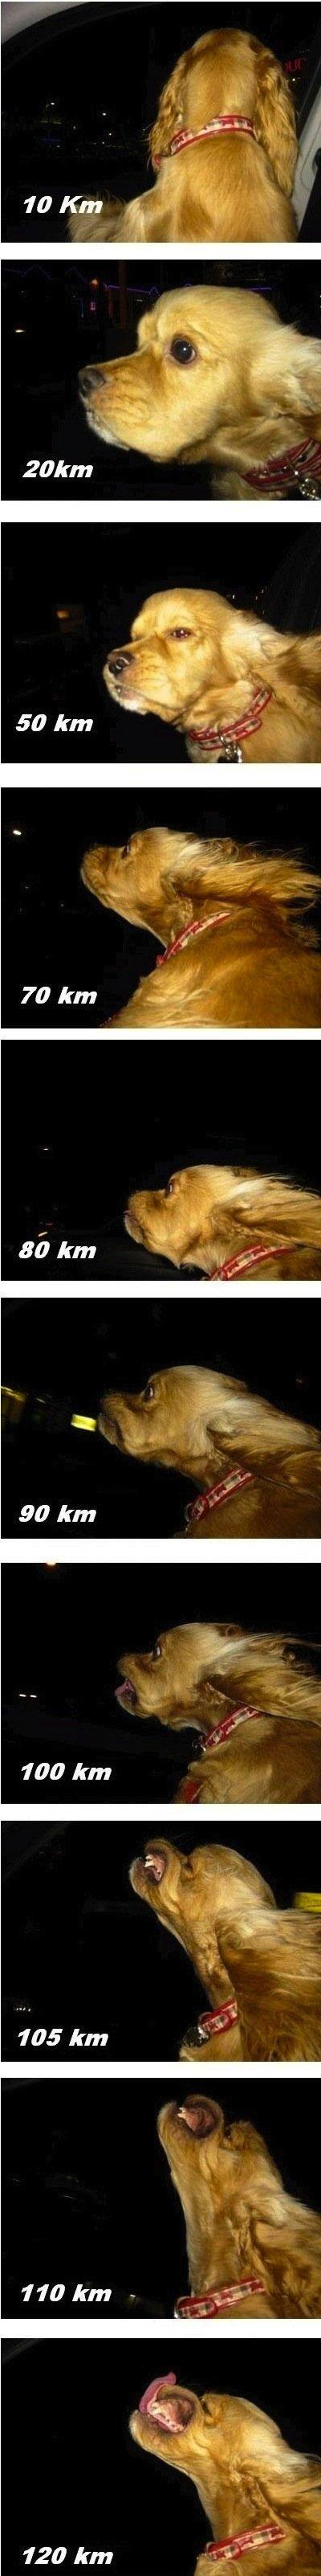 "Wind-Blown Dog. . was km t, ""ye tft,. 200mph !!"